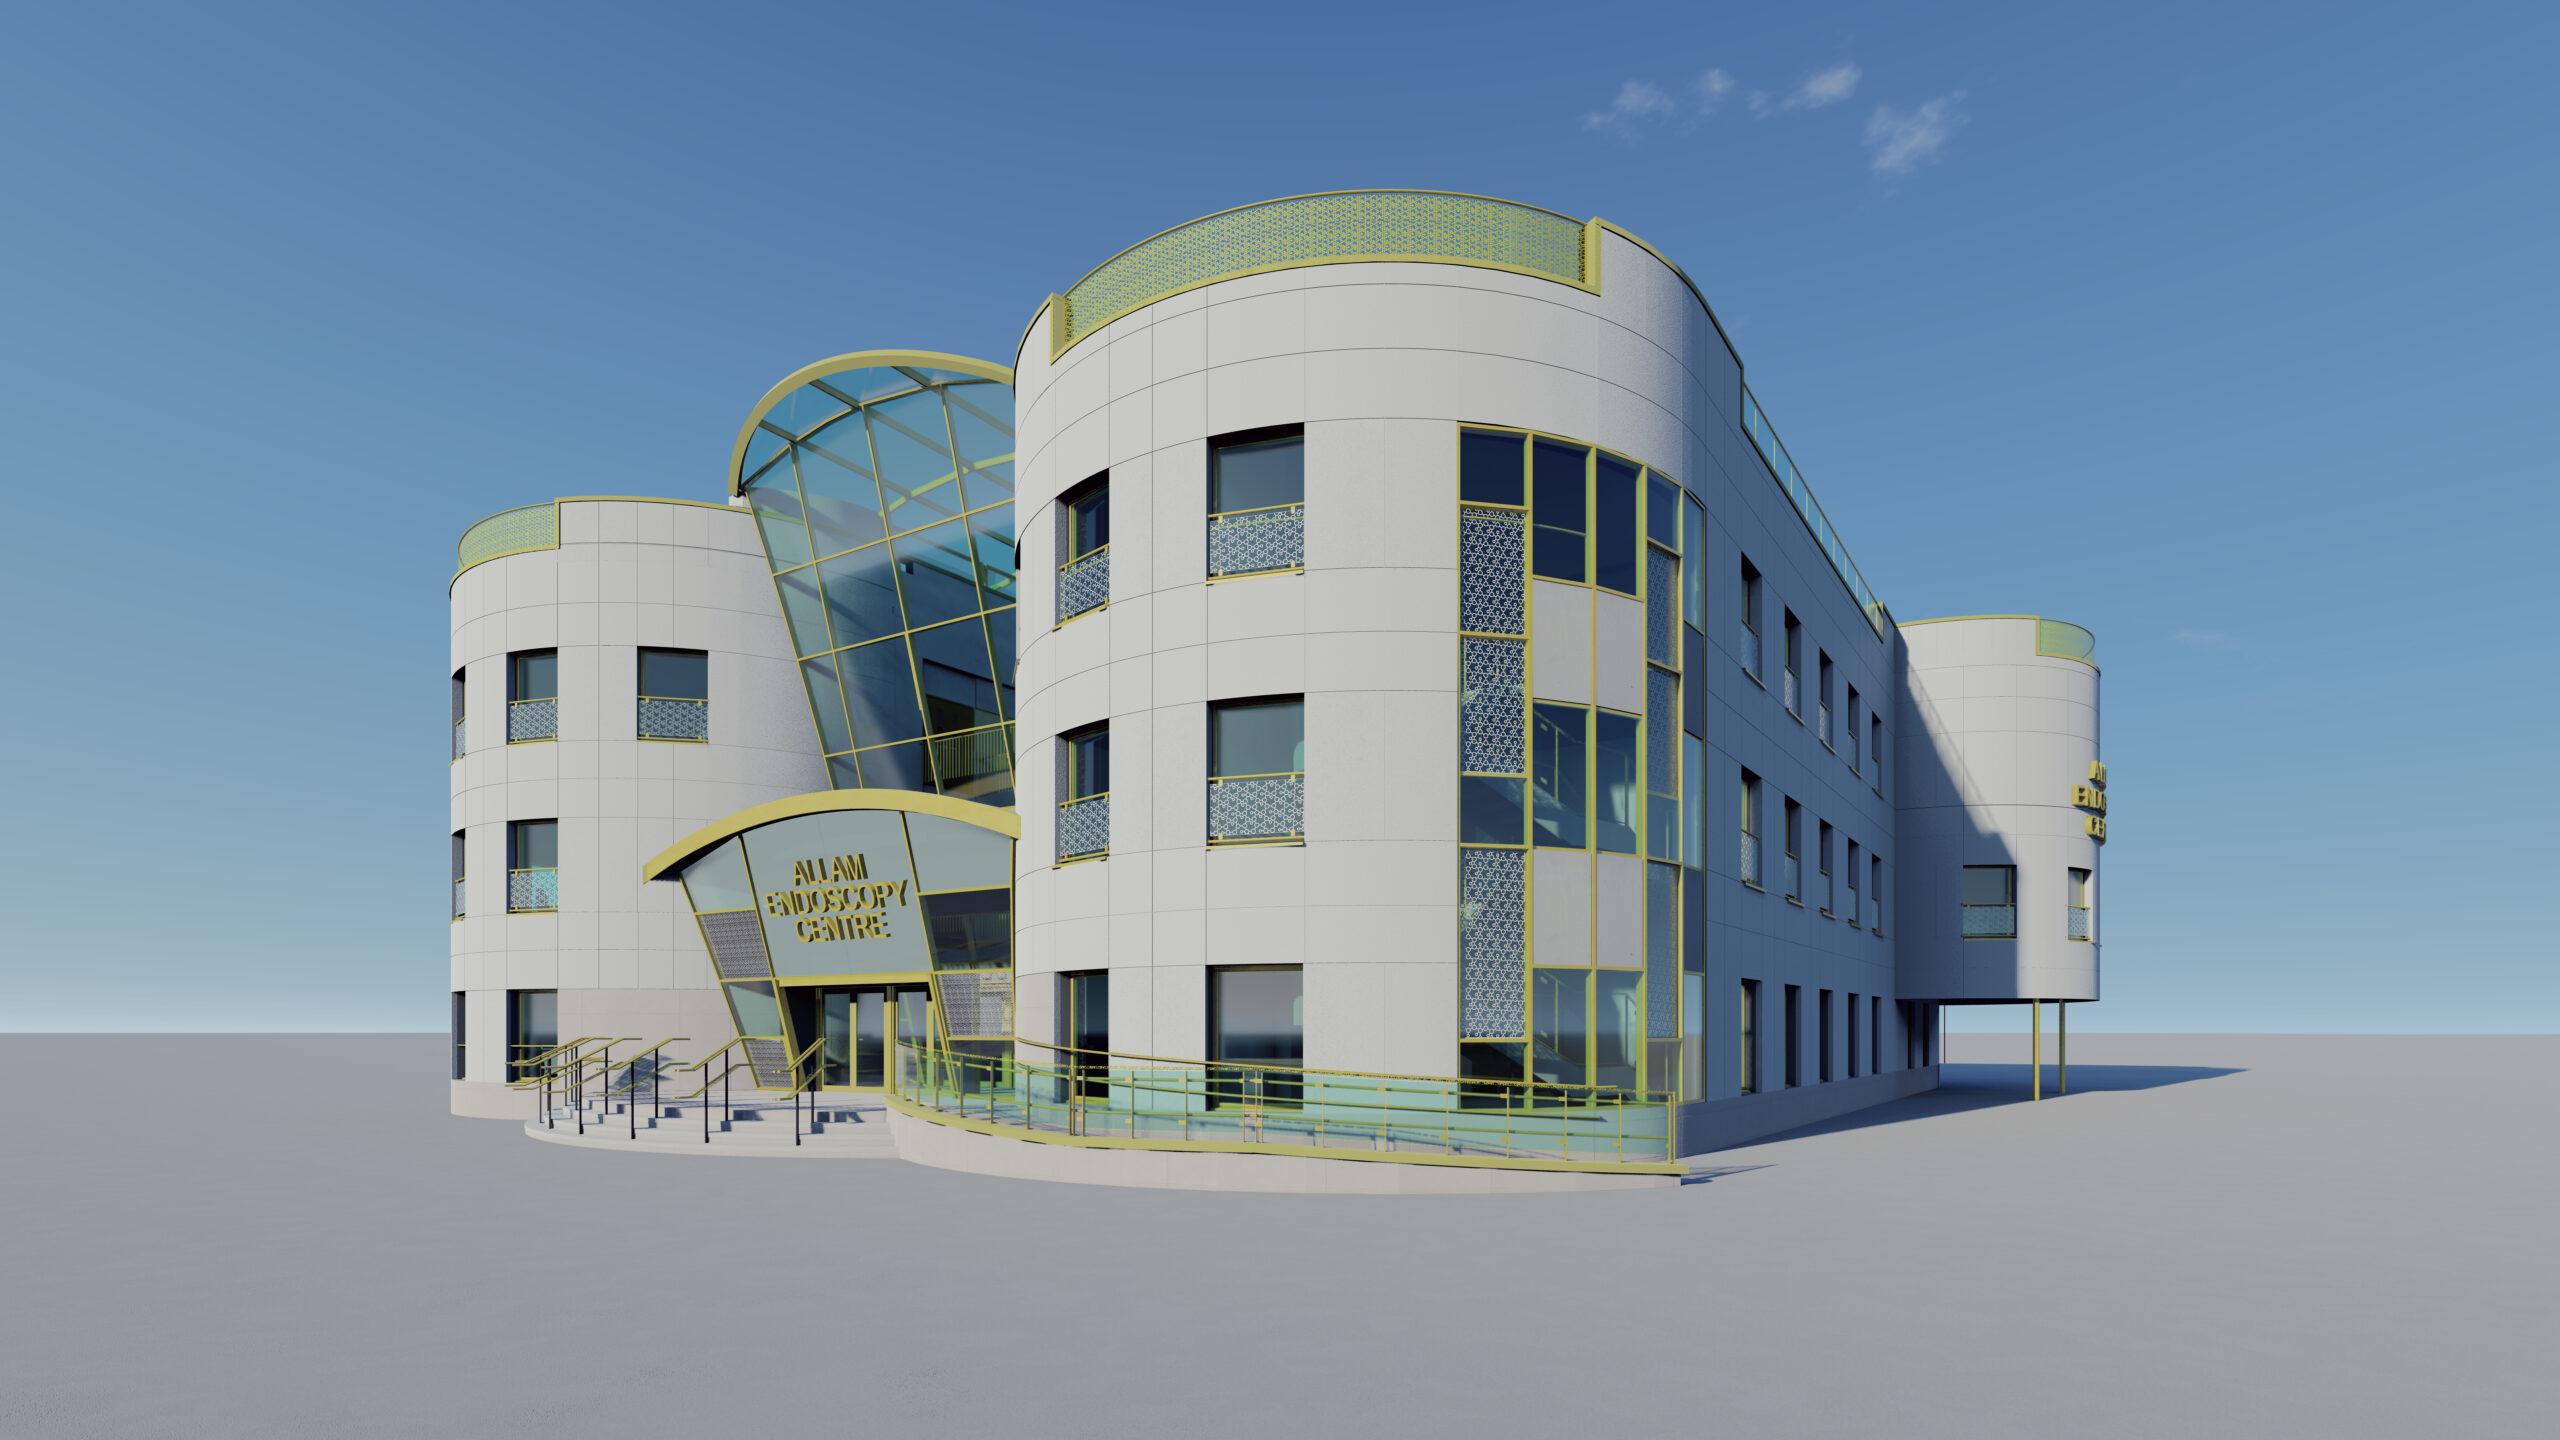 Allam Endoscopy Centre's Architectural Design - 3D Visualisation